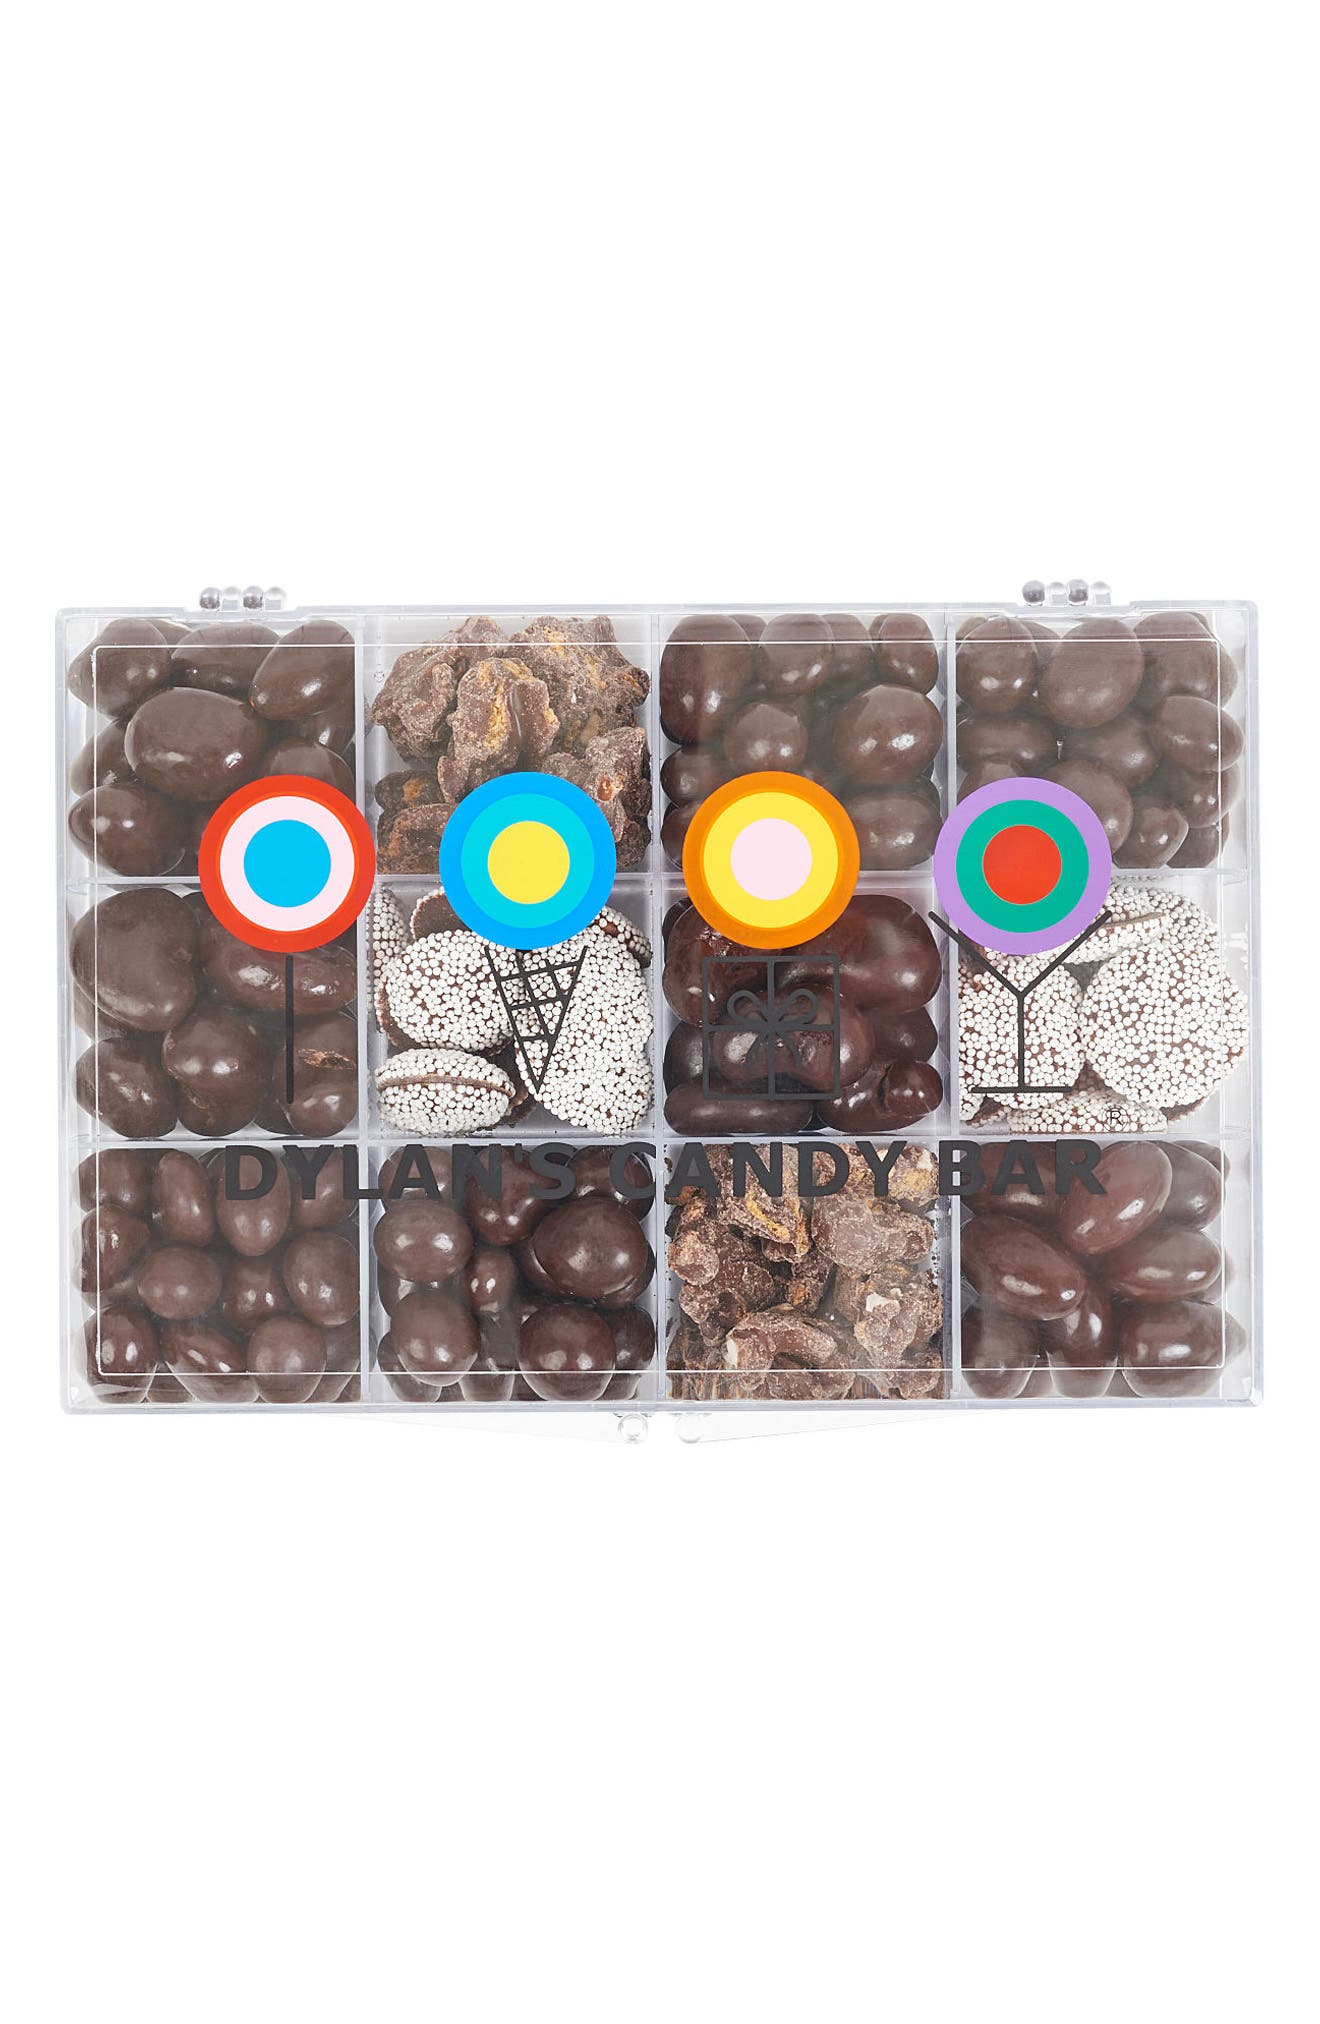 Main Image - Dylan's Candy Bar Signature Dark Chocolate Tackle Box